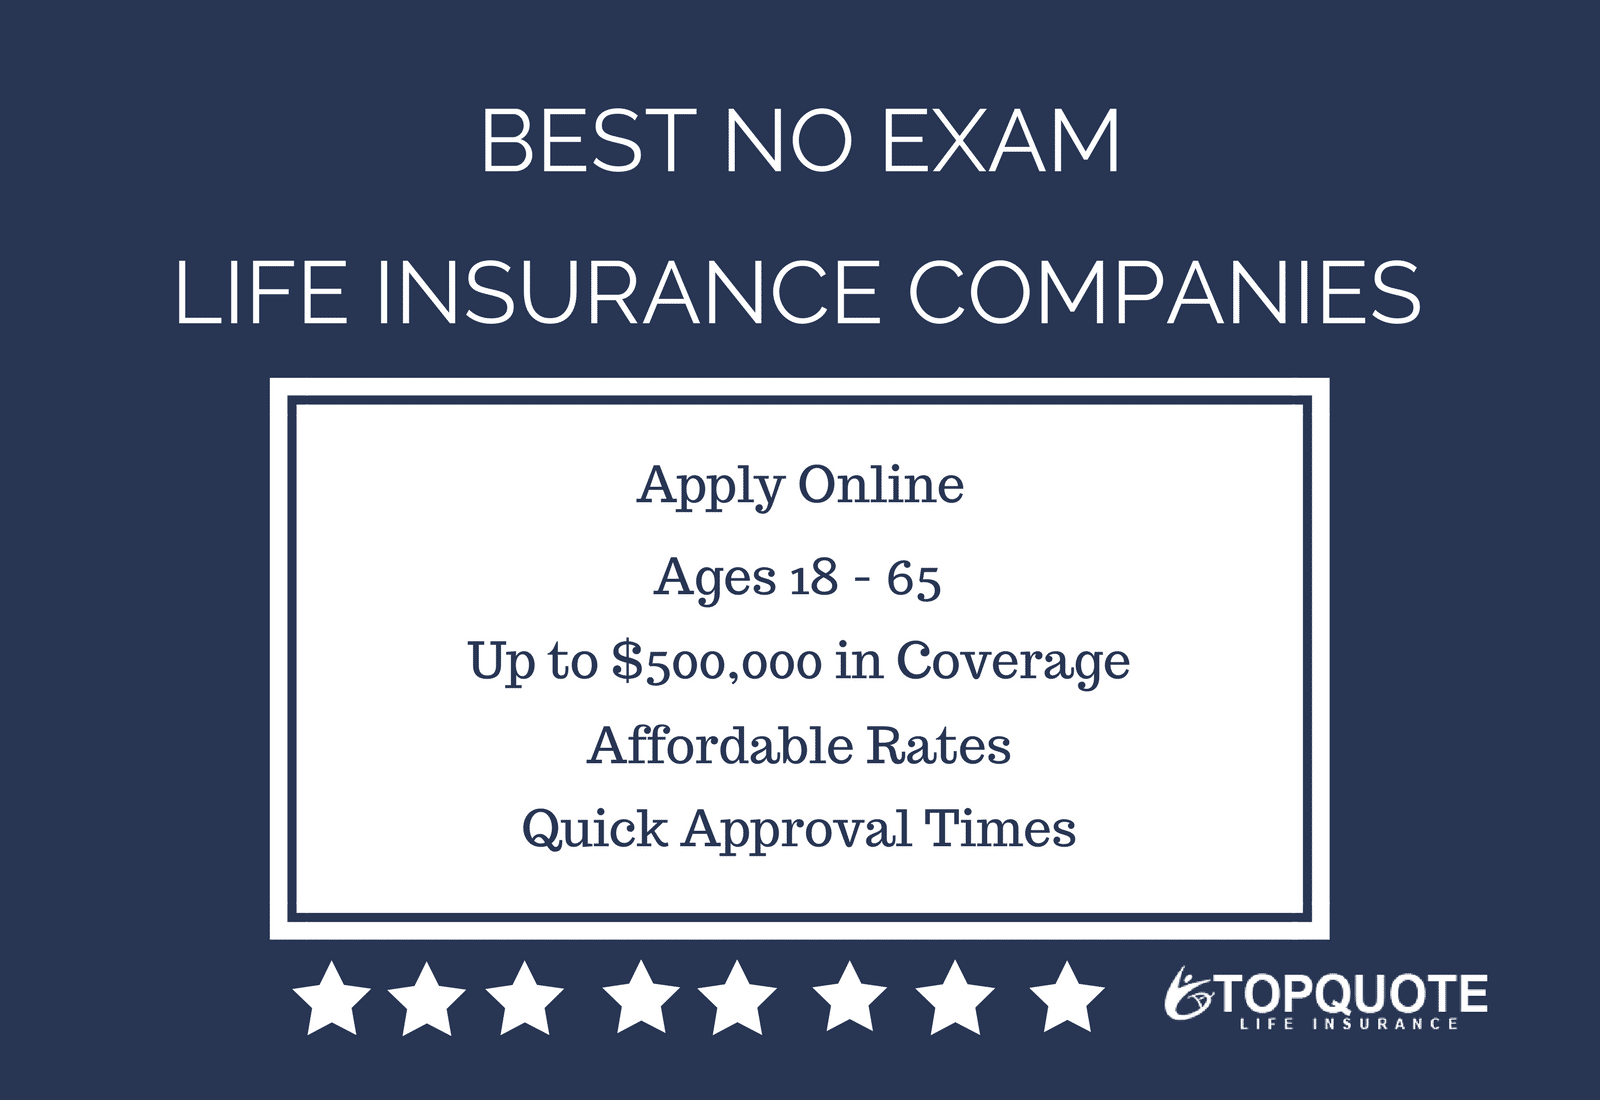 Life Insurance Quote Best No Exam Life Insurance Companies  Life Insurance  Pinterest .